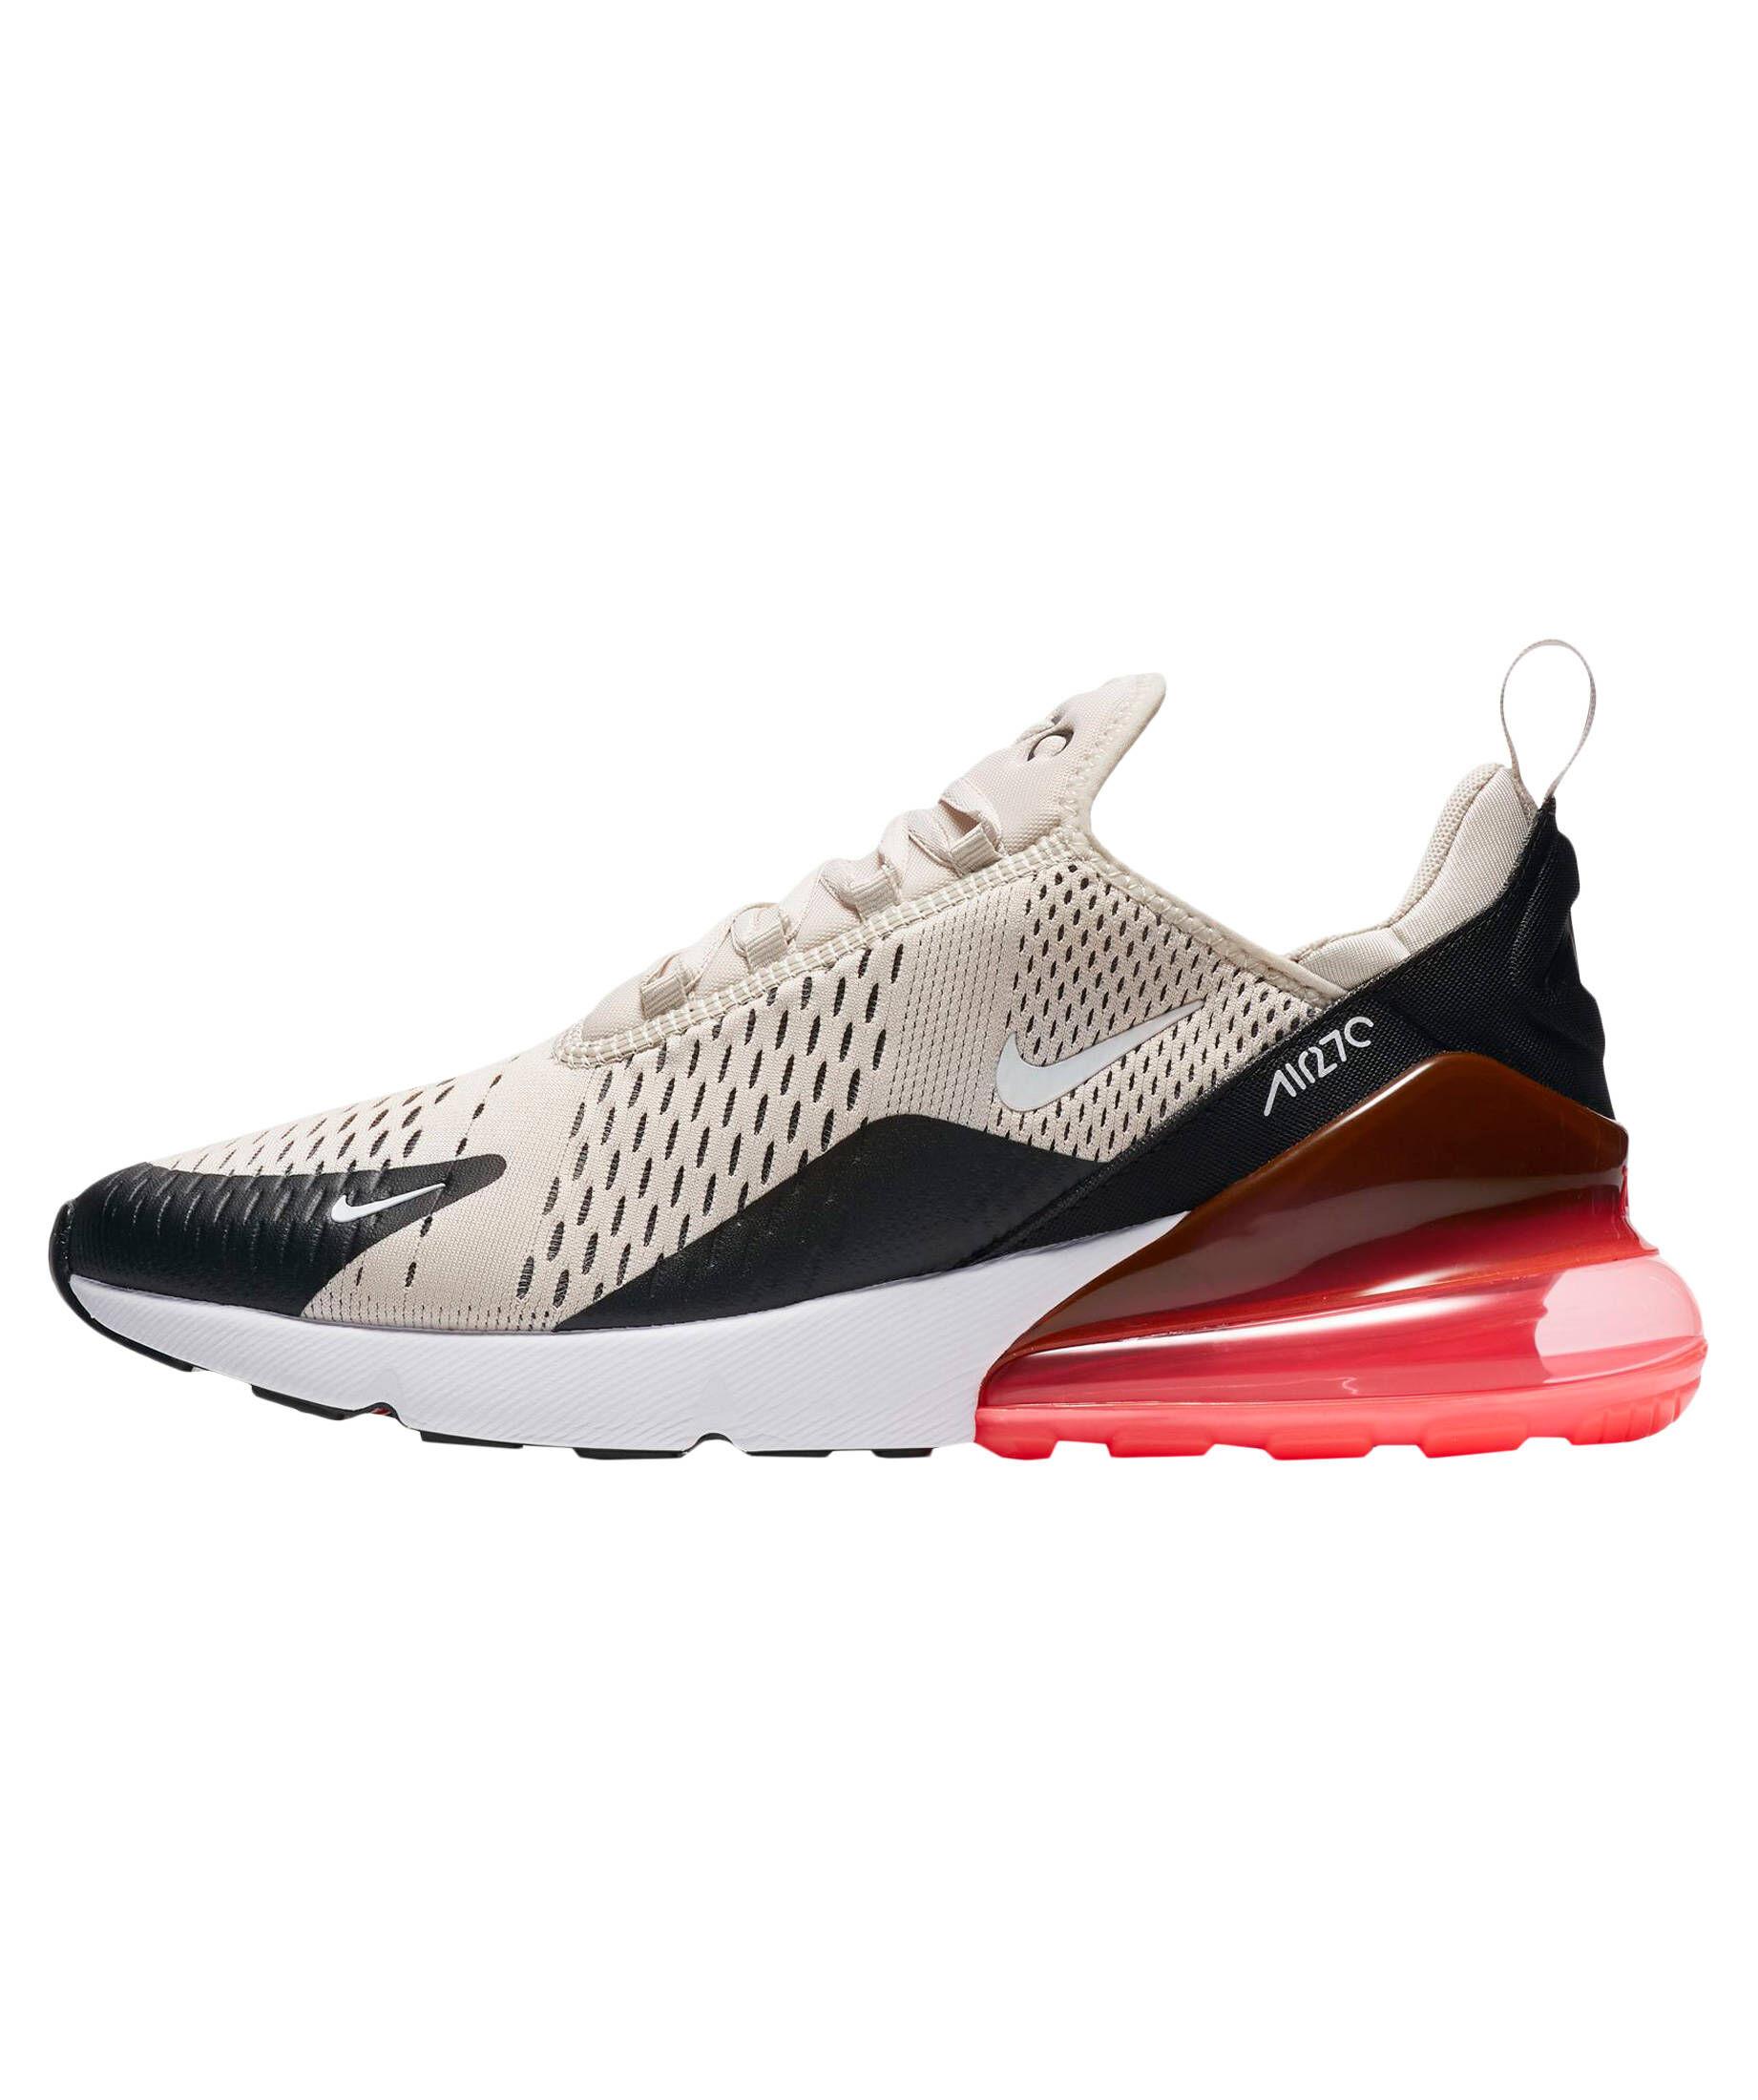 Max 270 Aq9164 100 Schuhe Nike Air Weiß nvN0mwOyP8